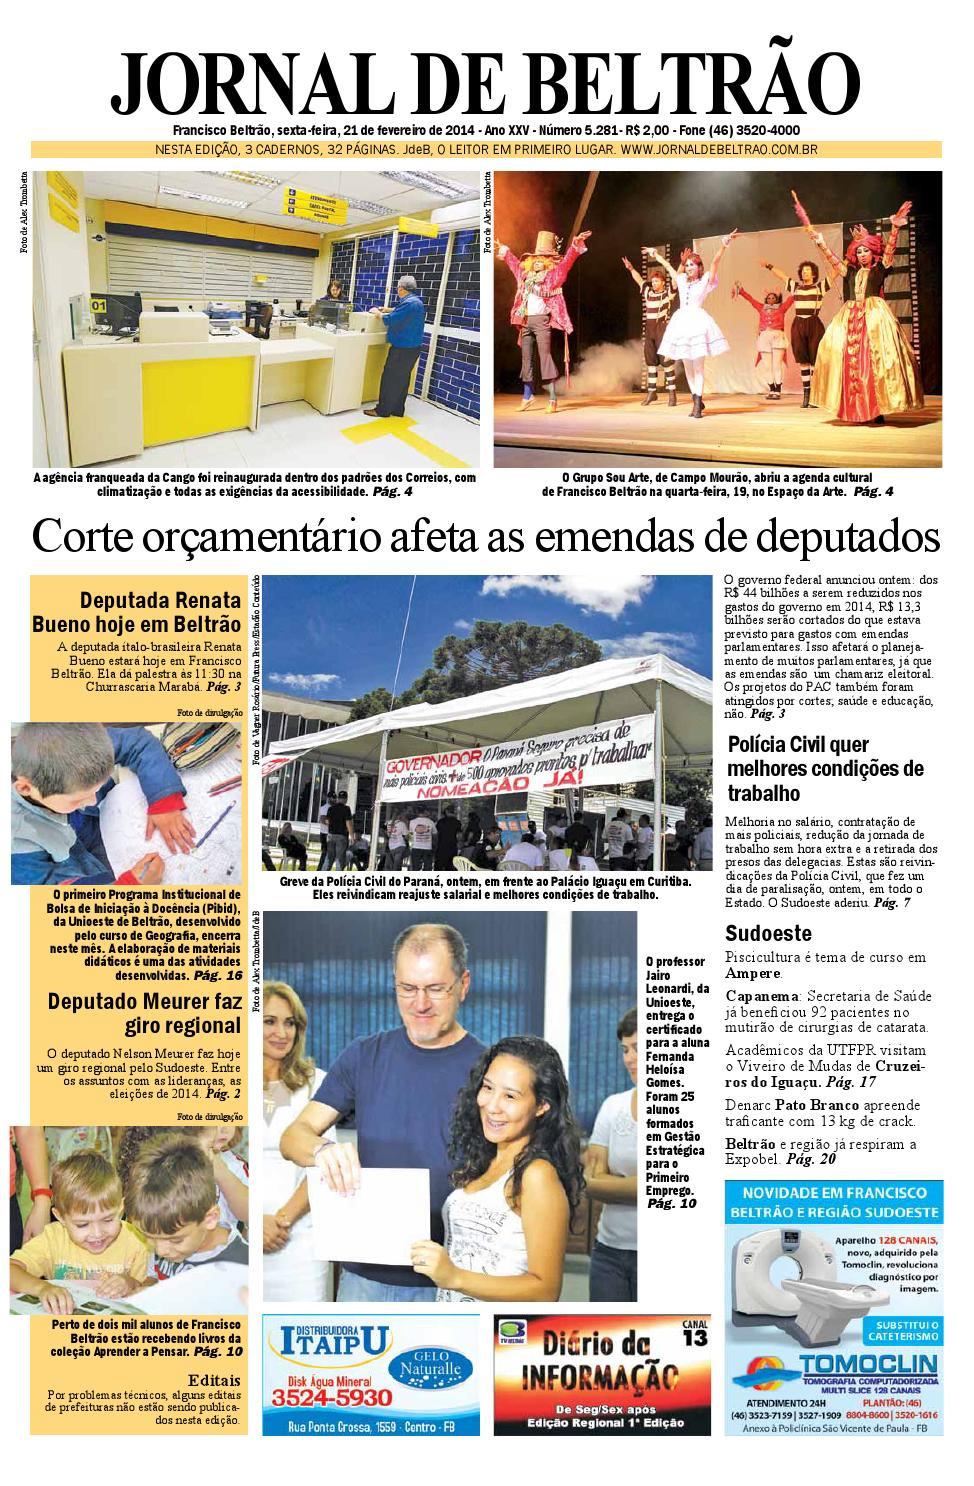 jornaldebeltrão 5281 2014-02-21.pdf by Orangotoe - issuu 66cb1ae7735aa